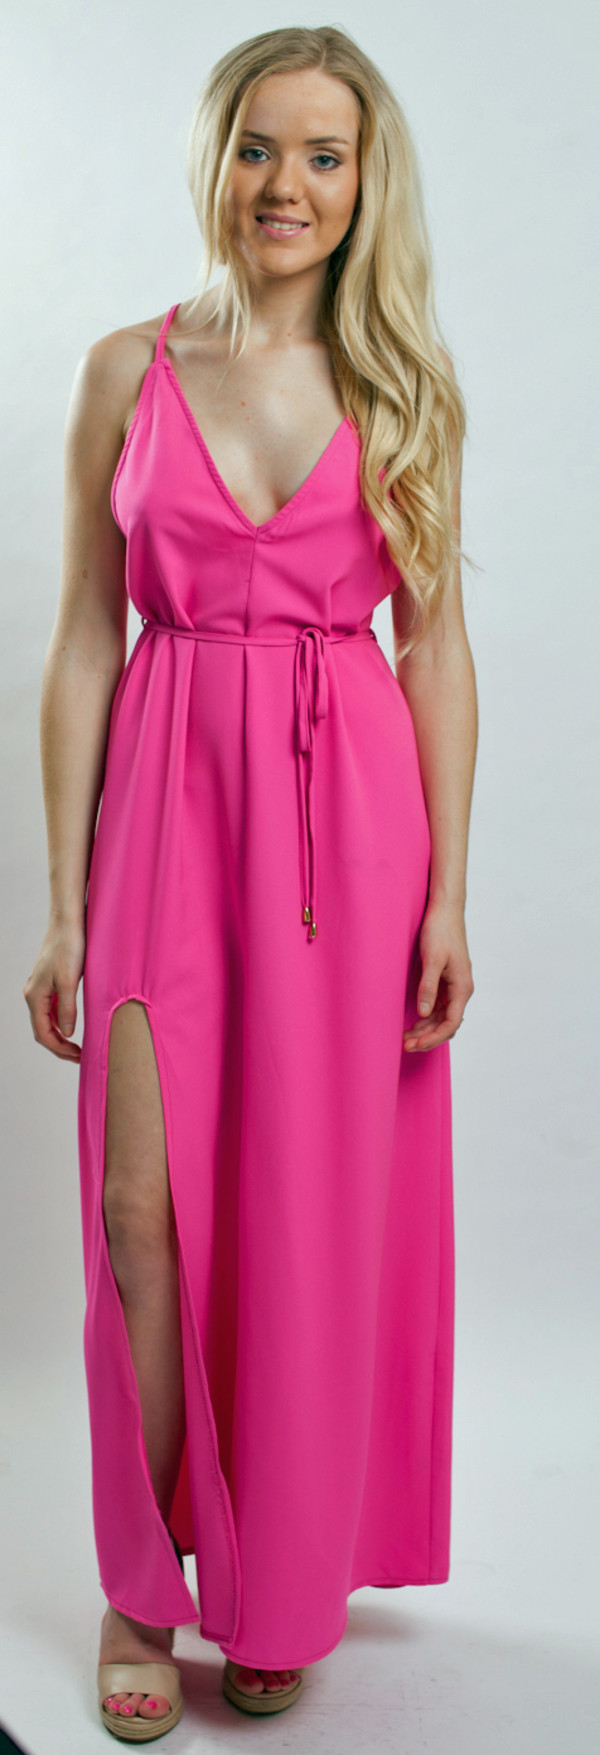 dress maxi hot pink